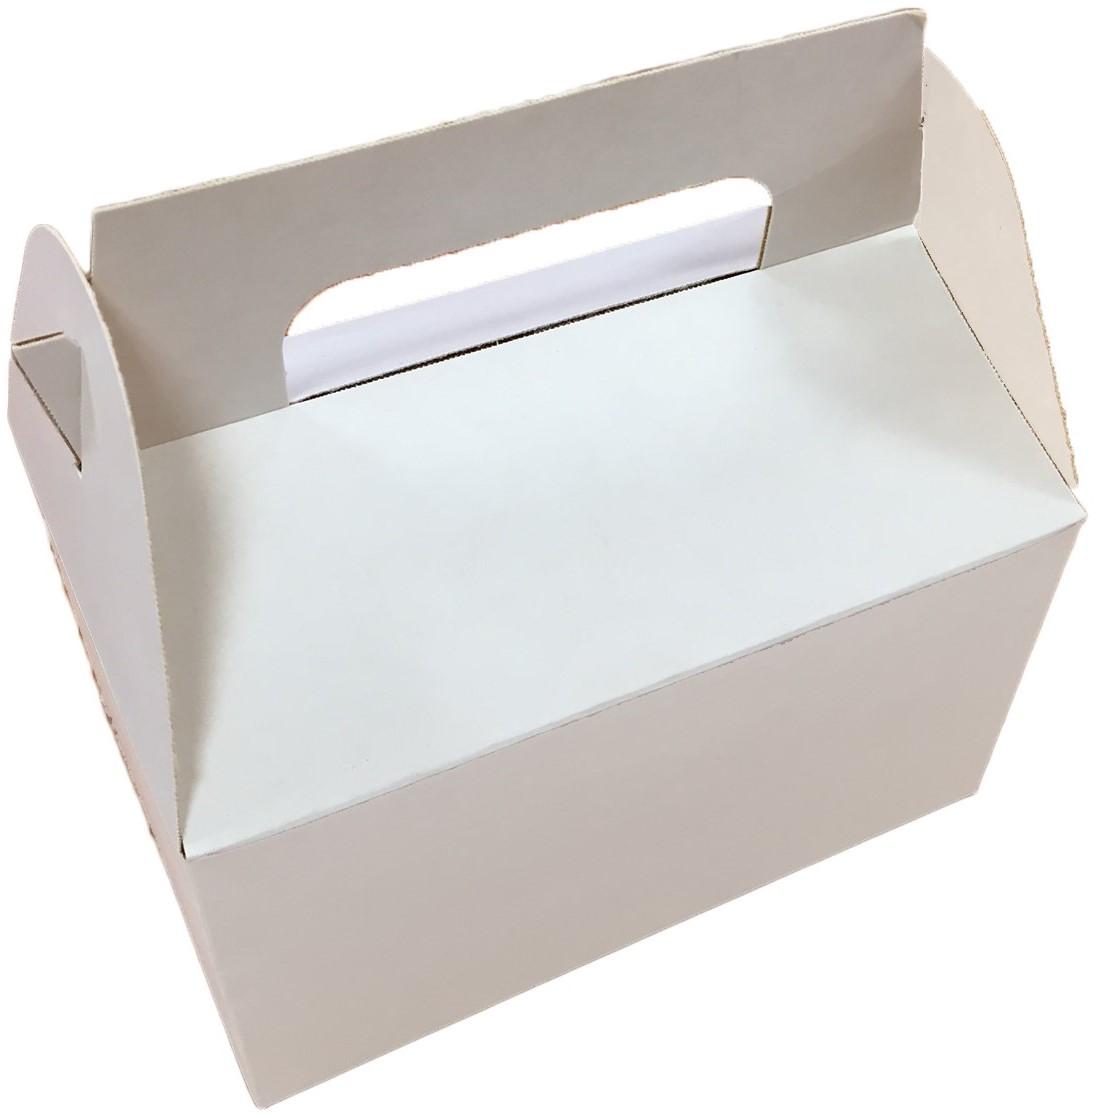 40013 Caja Maletín Anónima Blanca Image